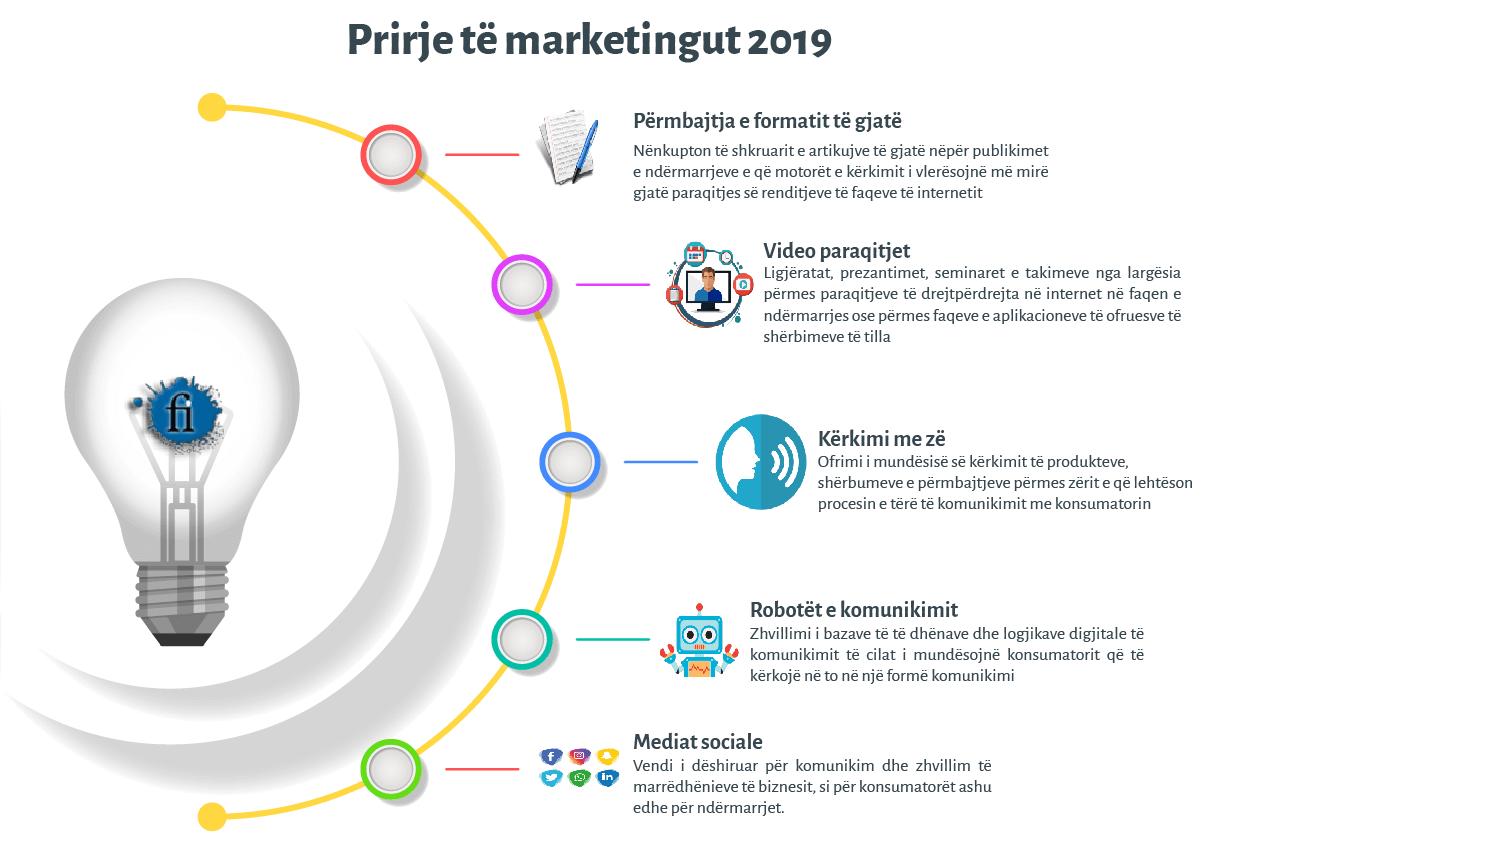 prirjet e marketingut 2019